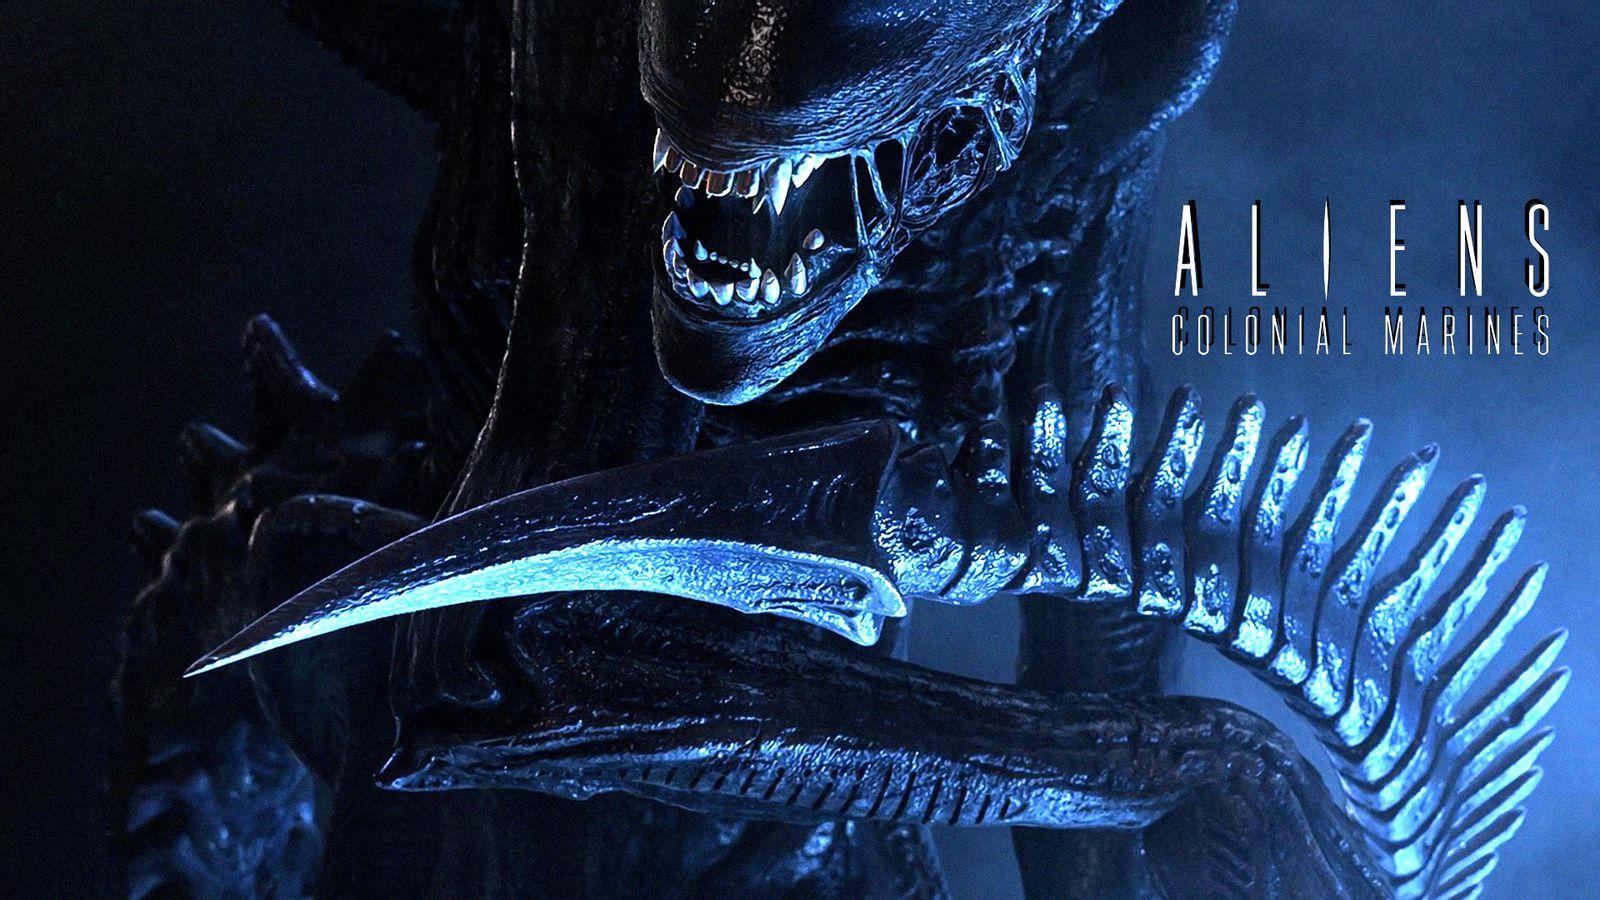 [MON AVIS] Aliens Colonial Marines